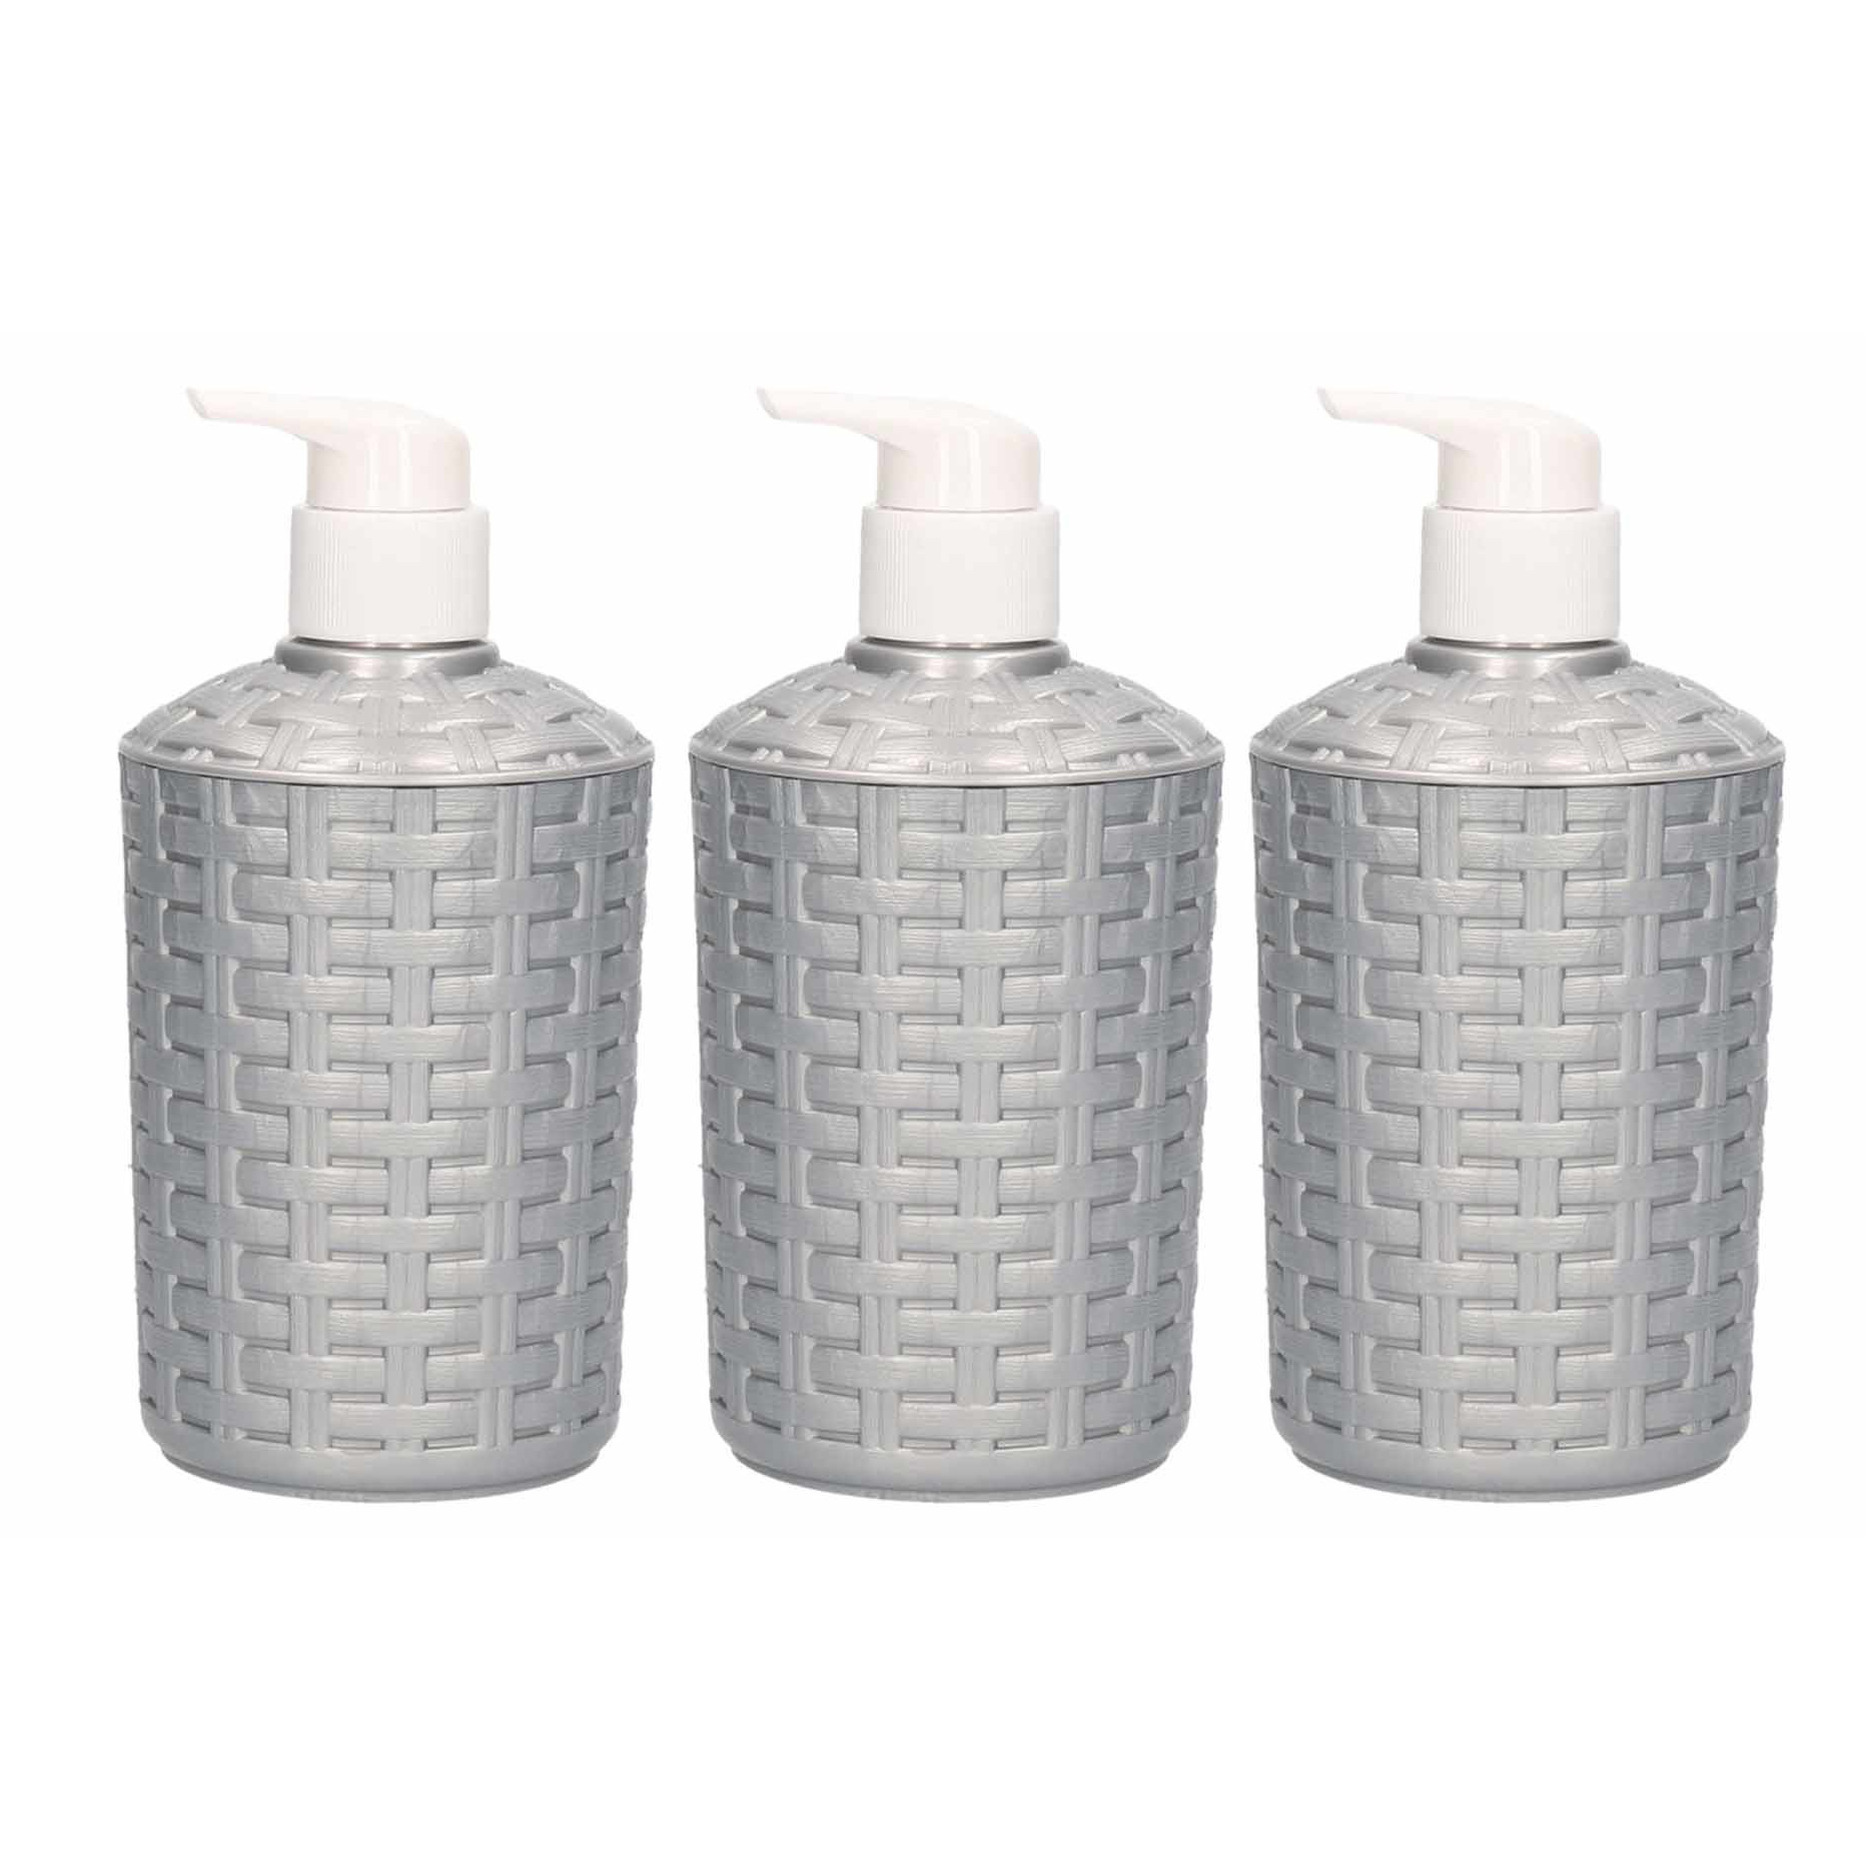 10x Zeep pompjes-dispensers zilver geweven 16 cm